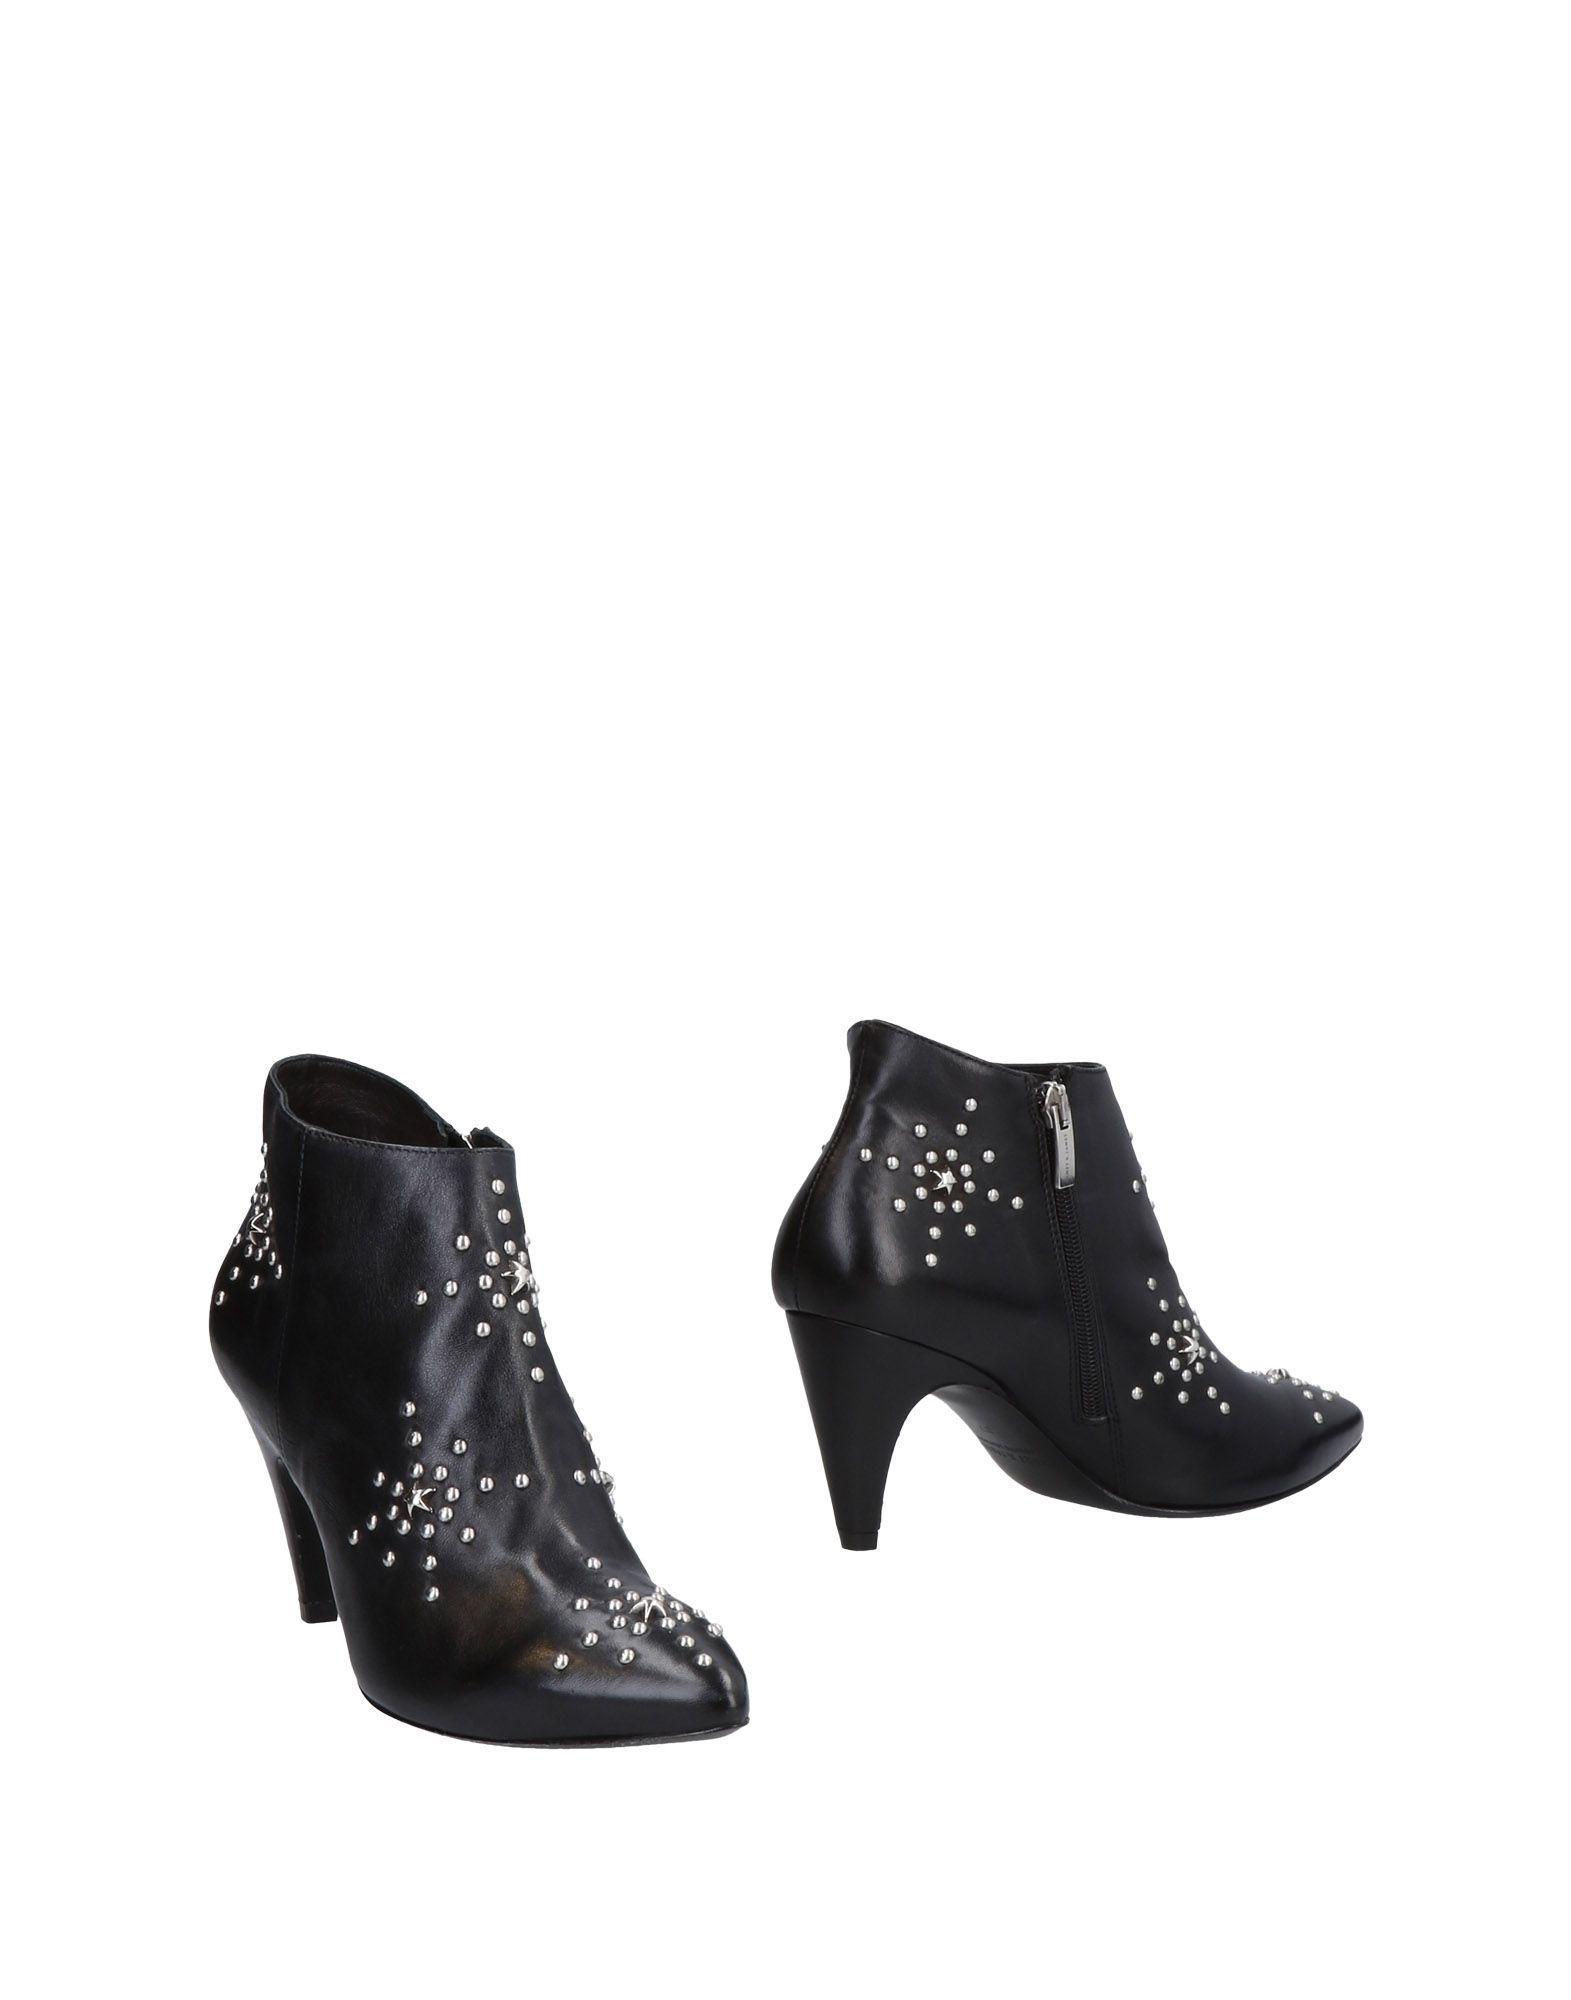 Janet & Janet Stiefelette Damen  11467212QA 11467212QA 11467212QA Neue Schuhe 1f72c8